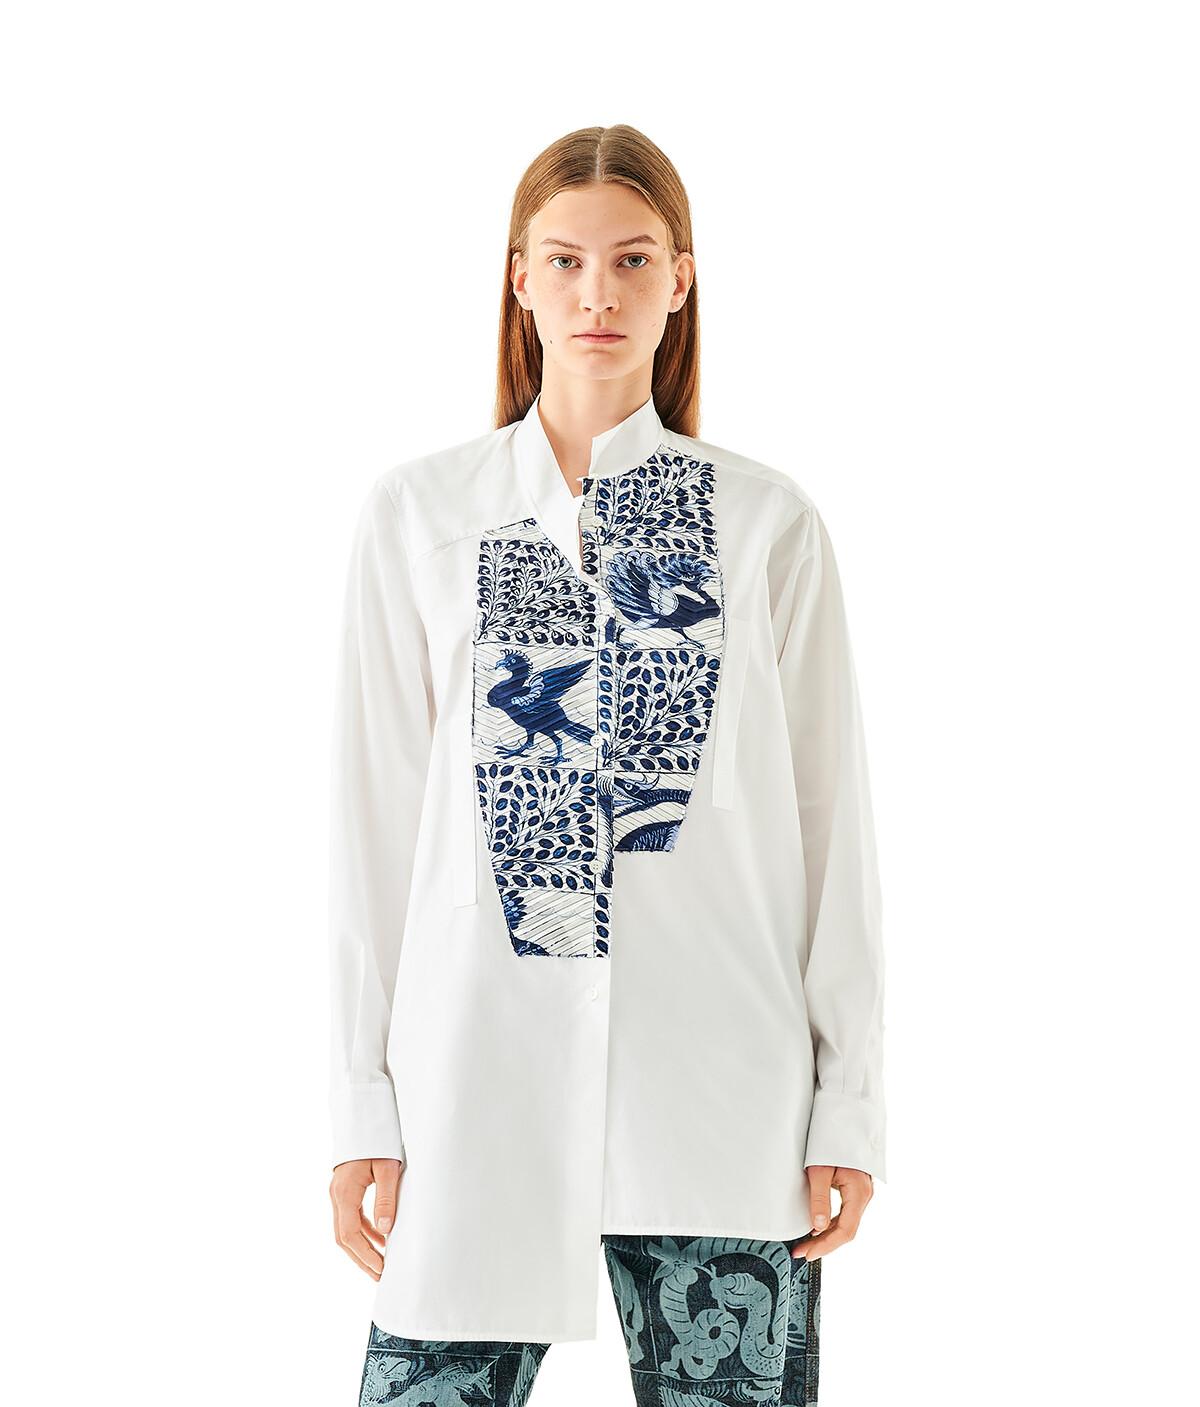 LOEWE Asymmetric Shirt Animals White/Blue front